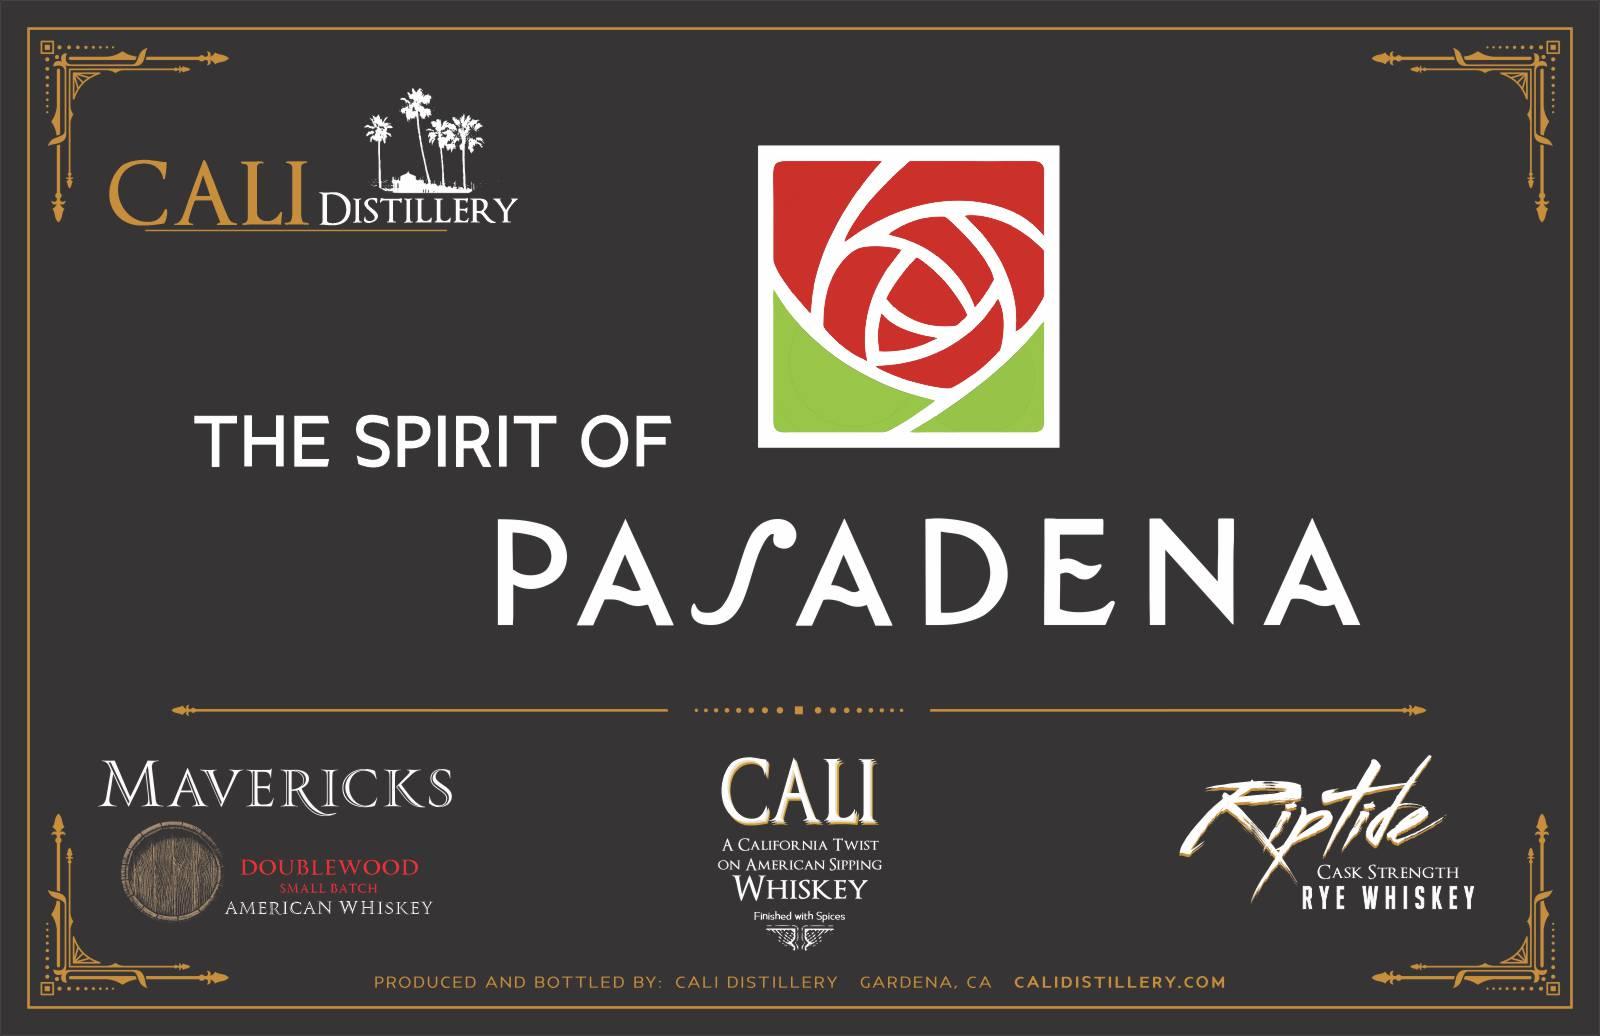 The Spirit of Pasadena - Whiskeys by Cali Distillery